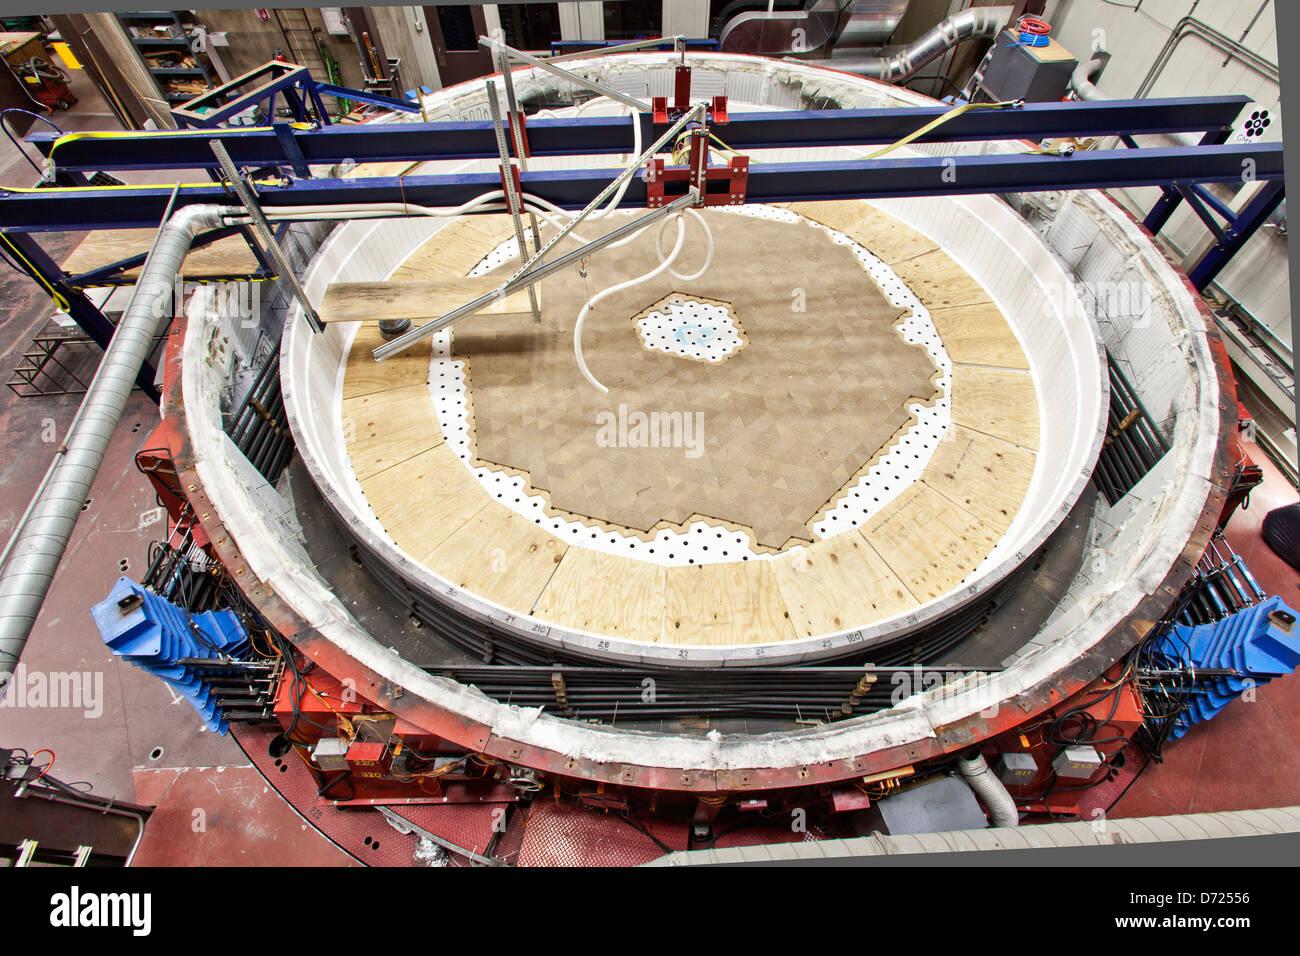 Construction of floor for Giant Magellan Telescope, mirror 3. - Stock Image